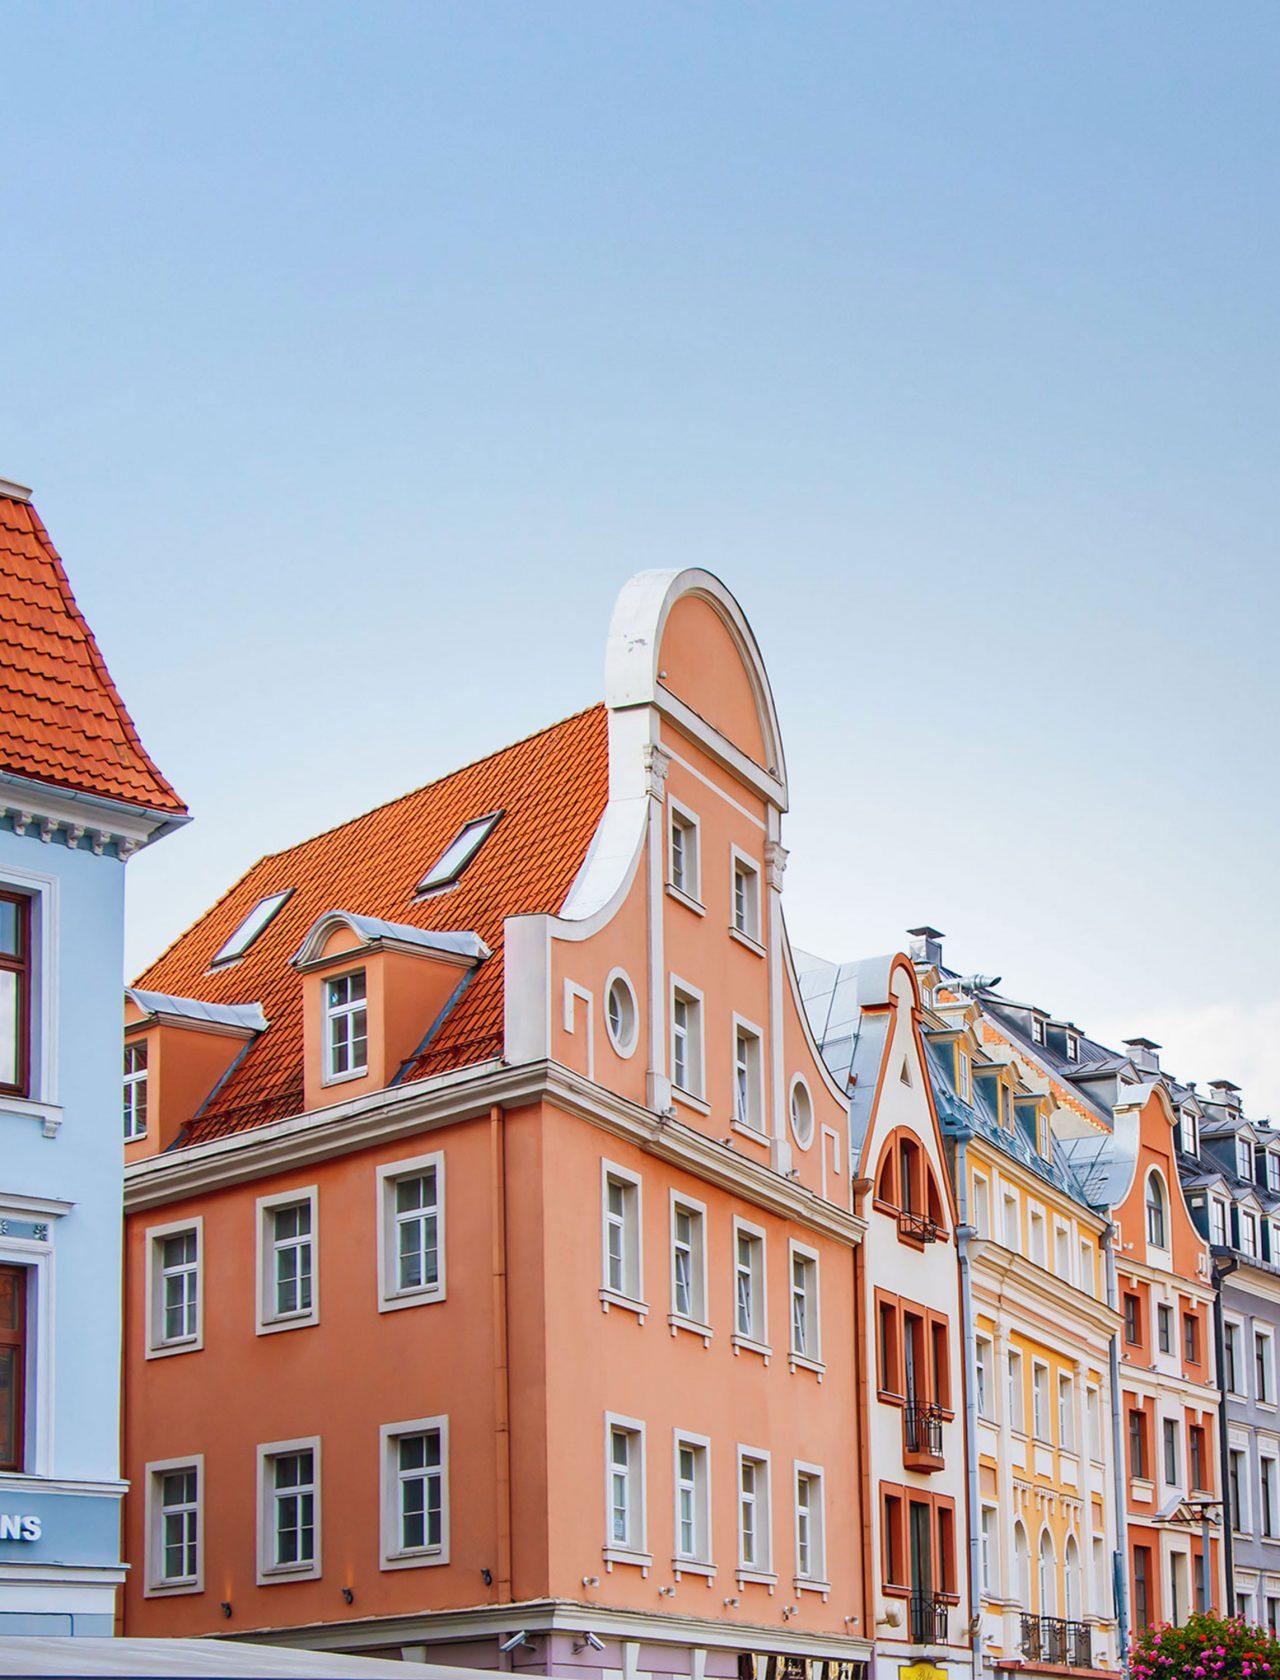 Häuserreihe in bunten Farben